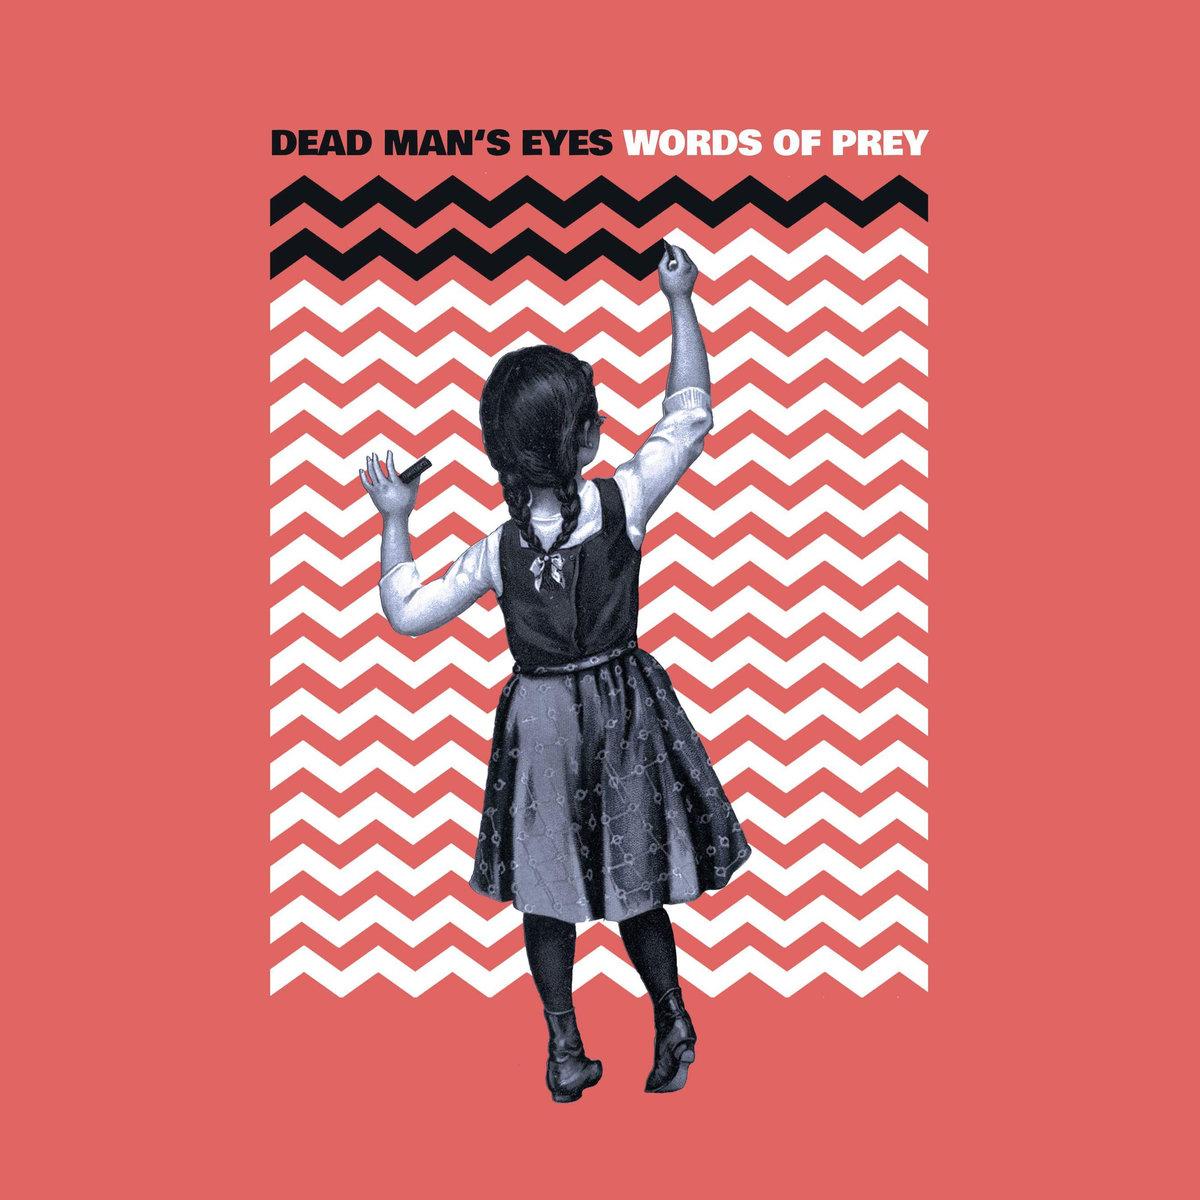 Dead Man's Eyes - Words of Prey